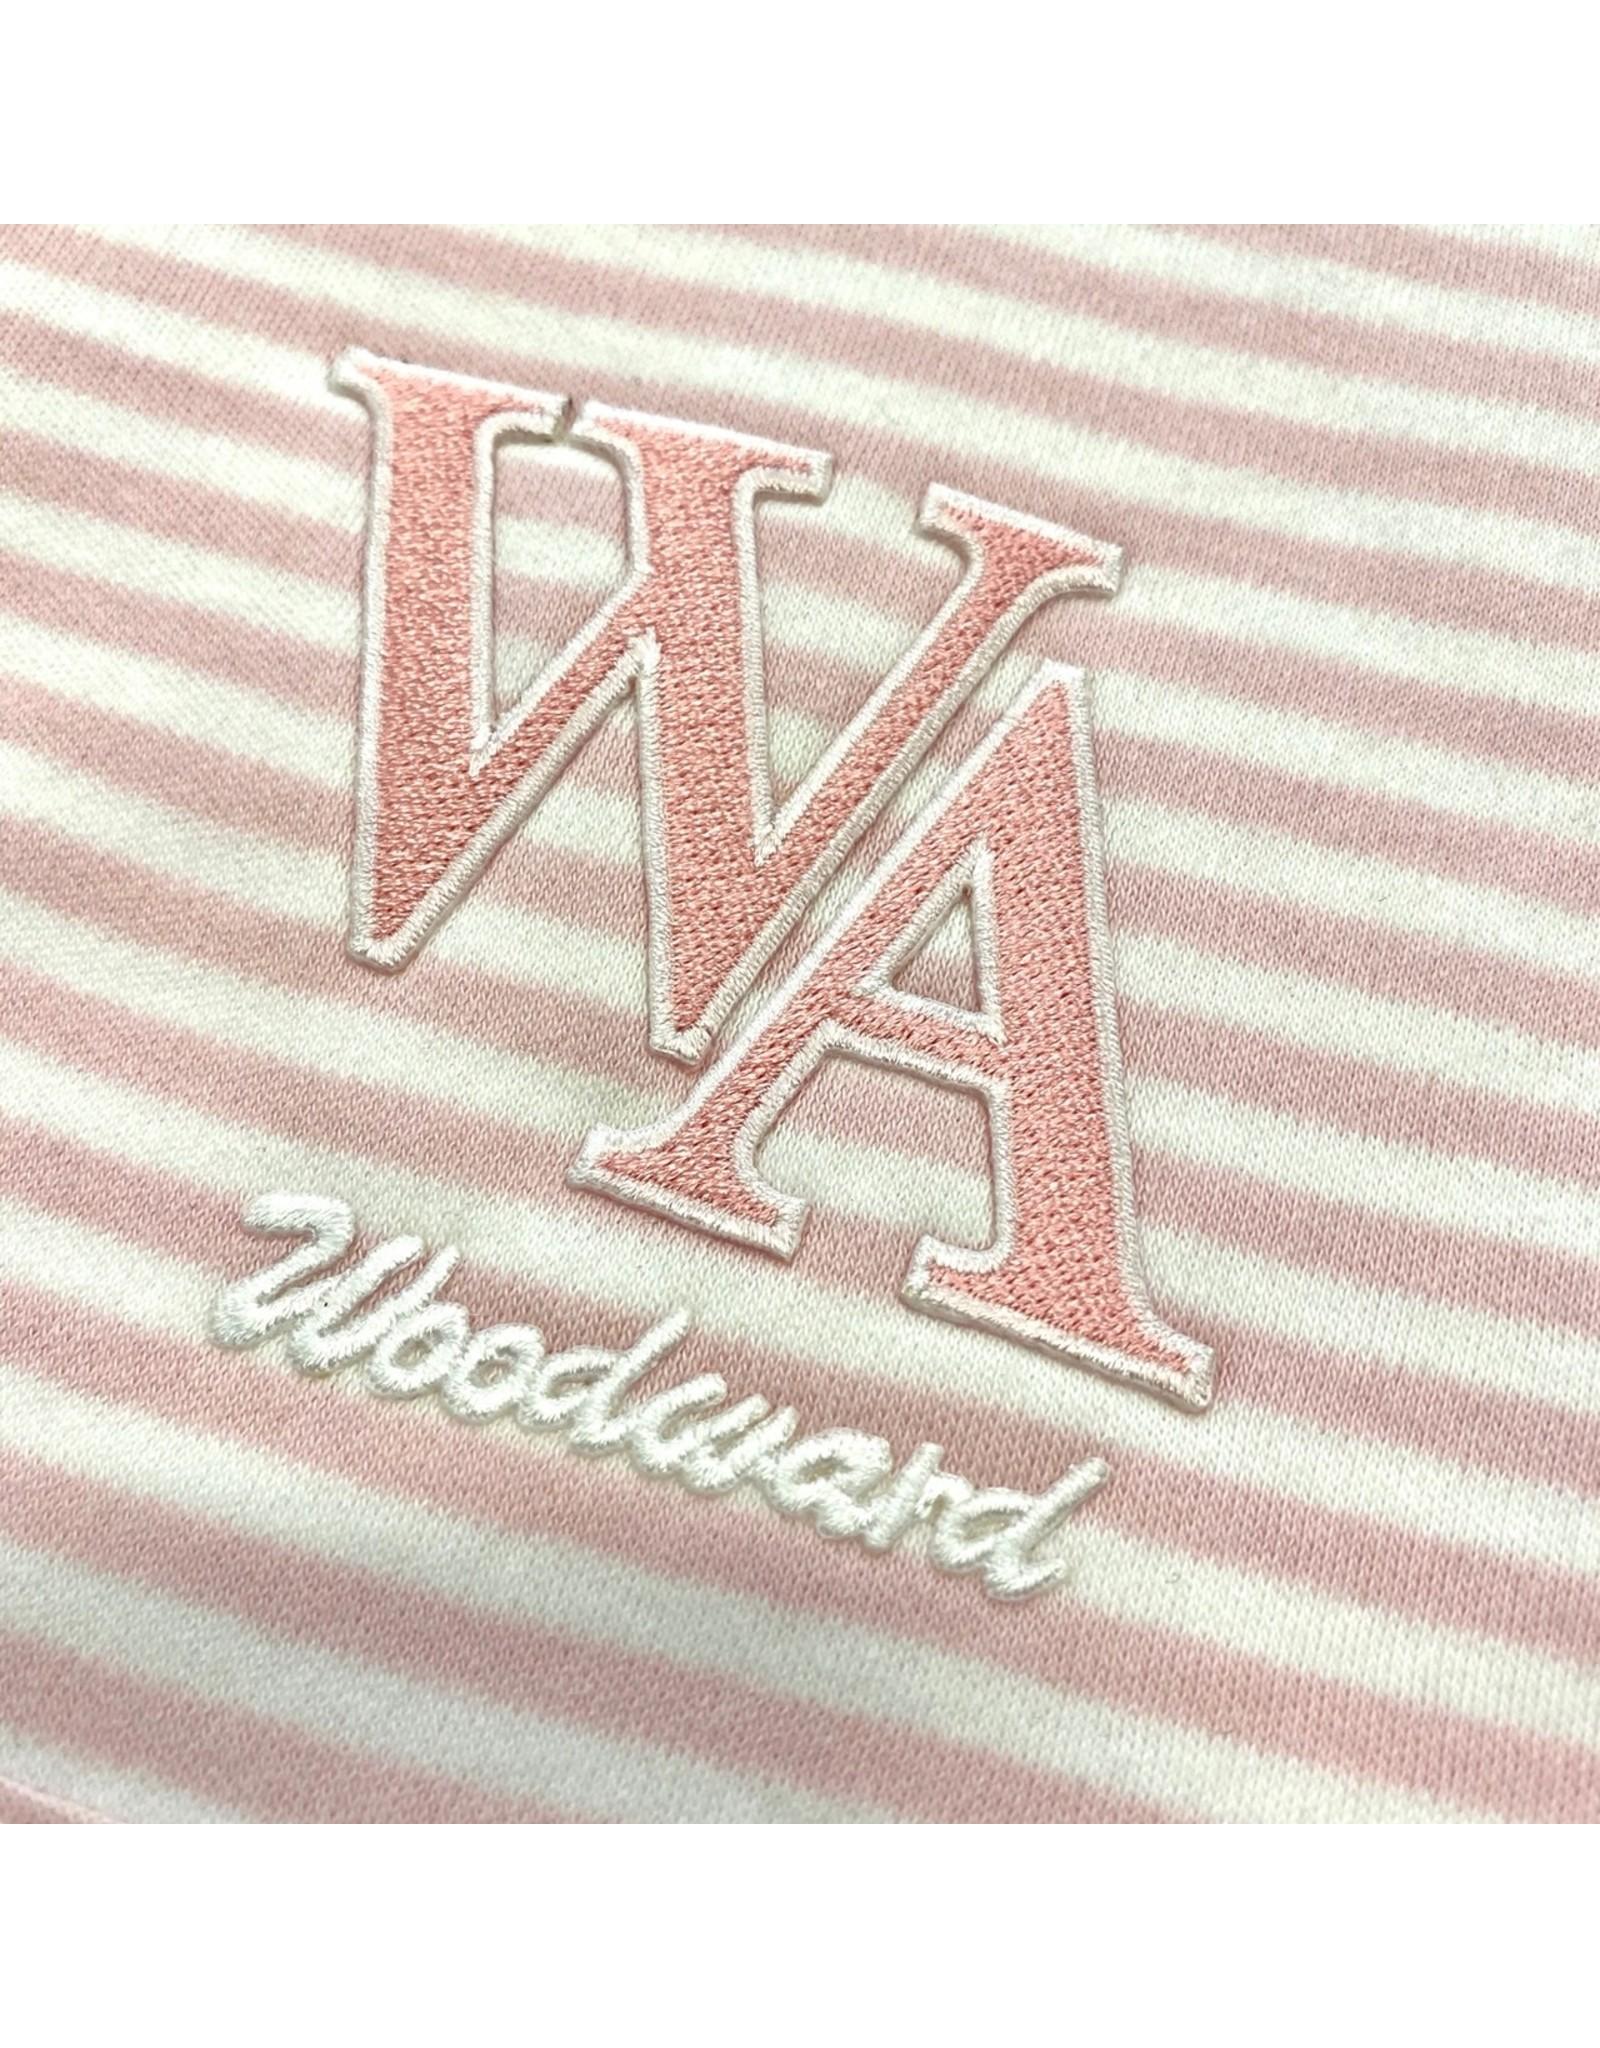 Creative Knitwear Baby Stripe Burp Pad by Creative Knitwear